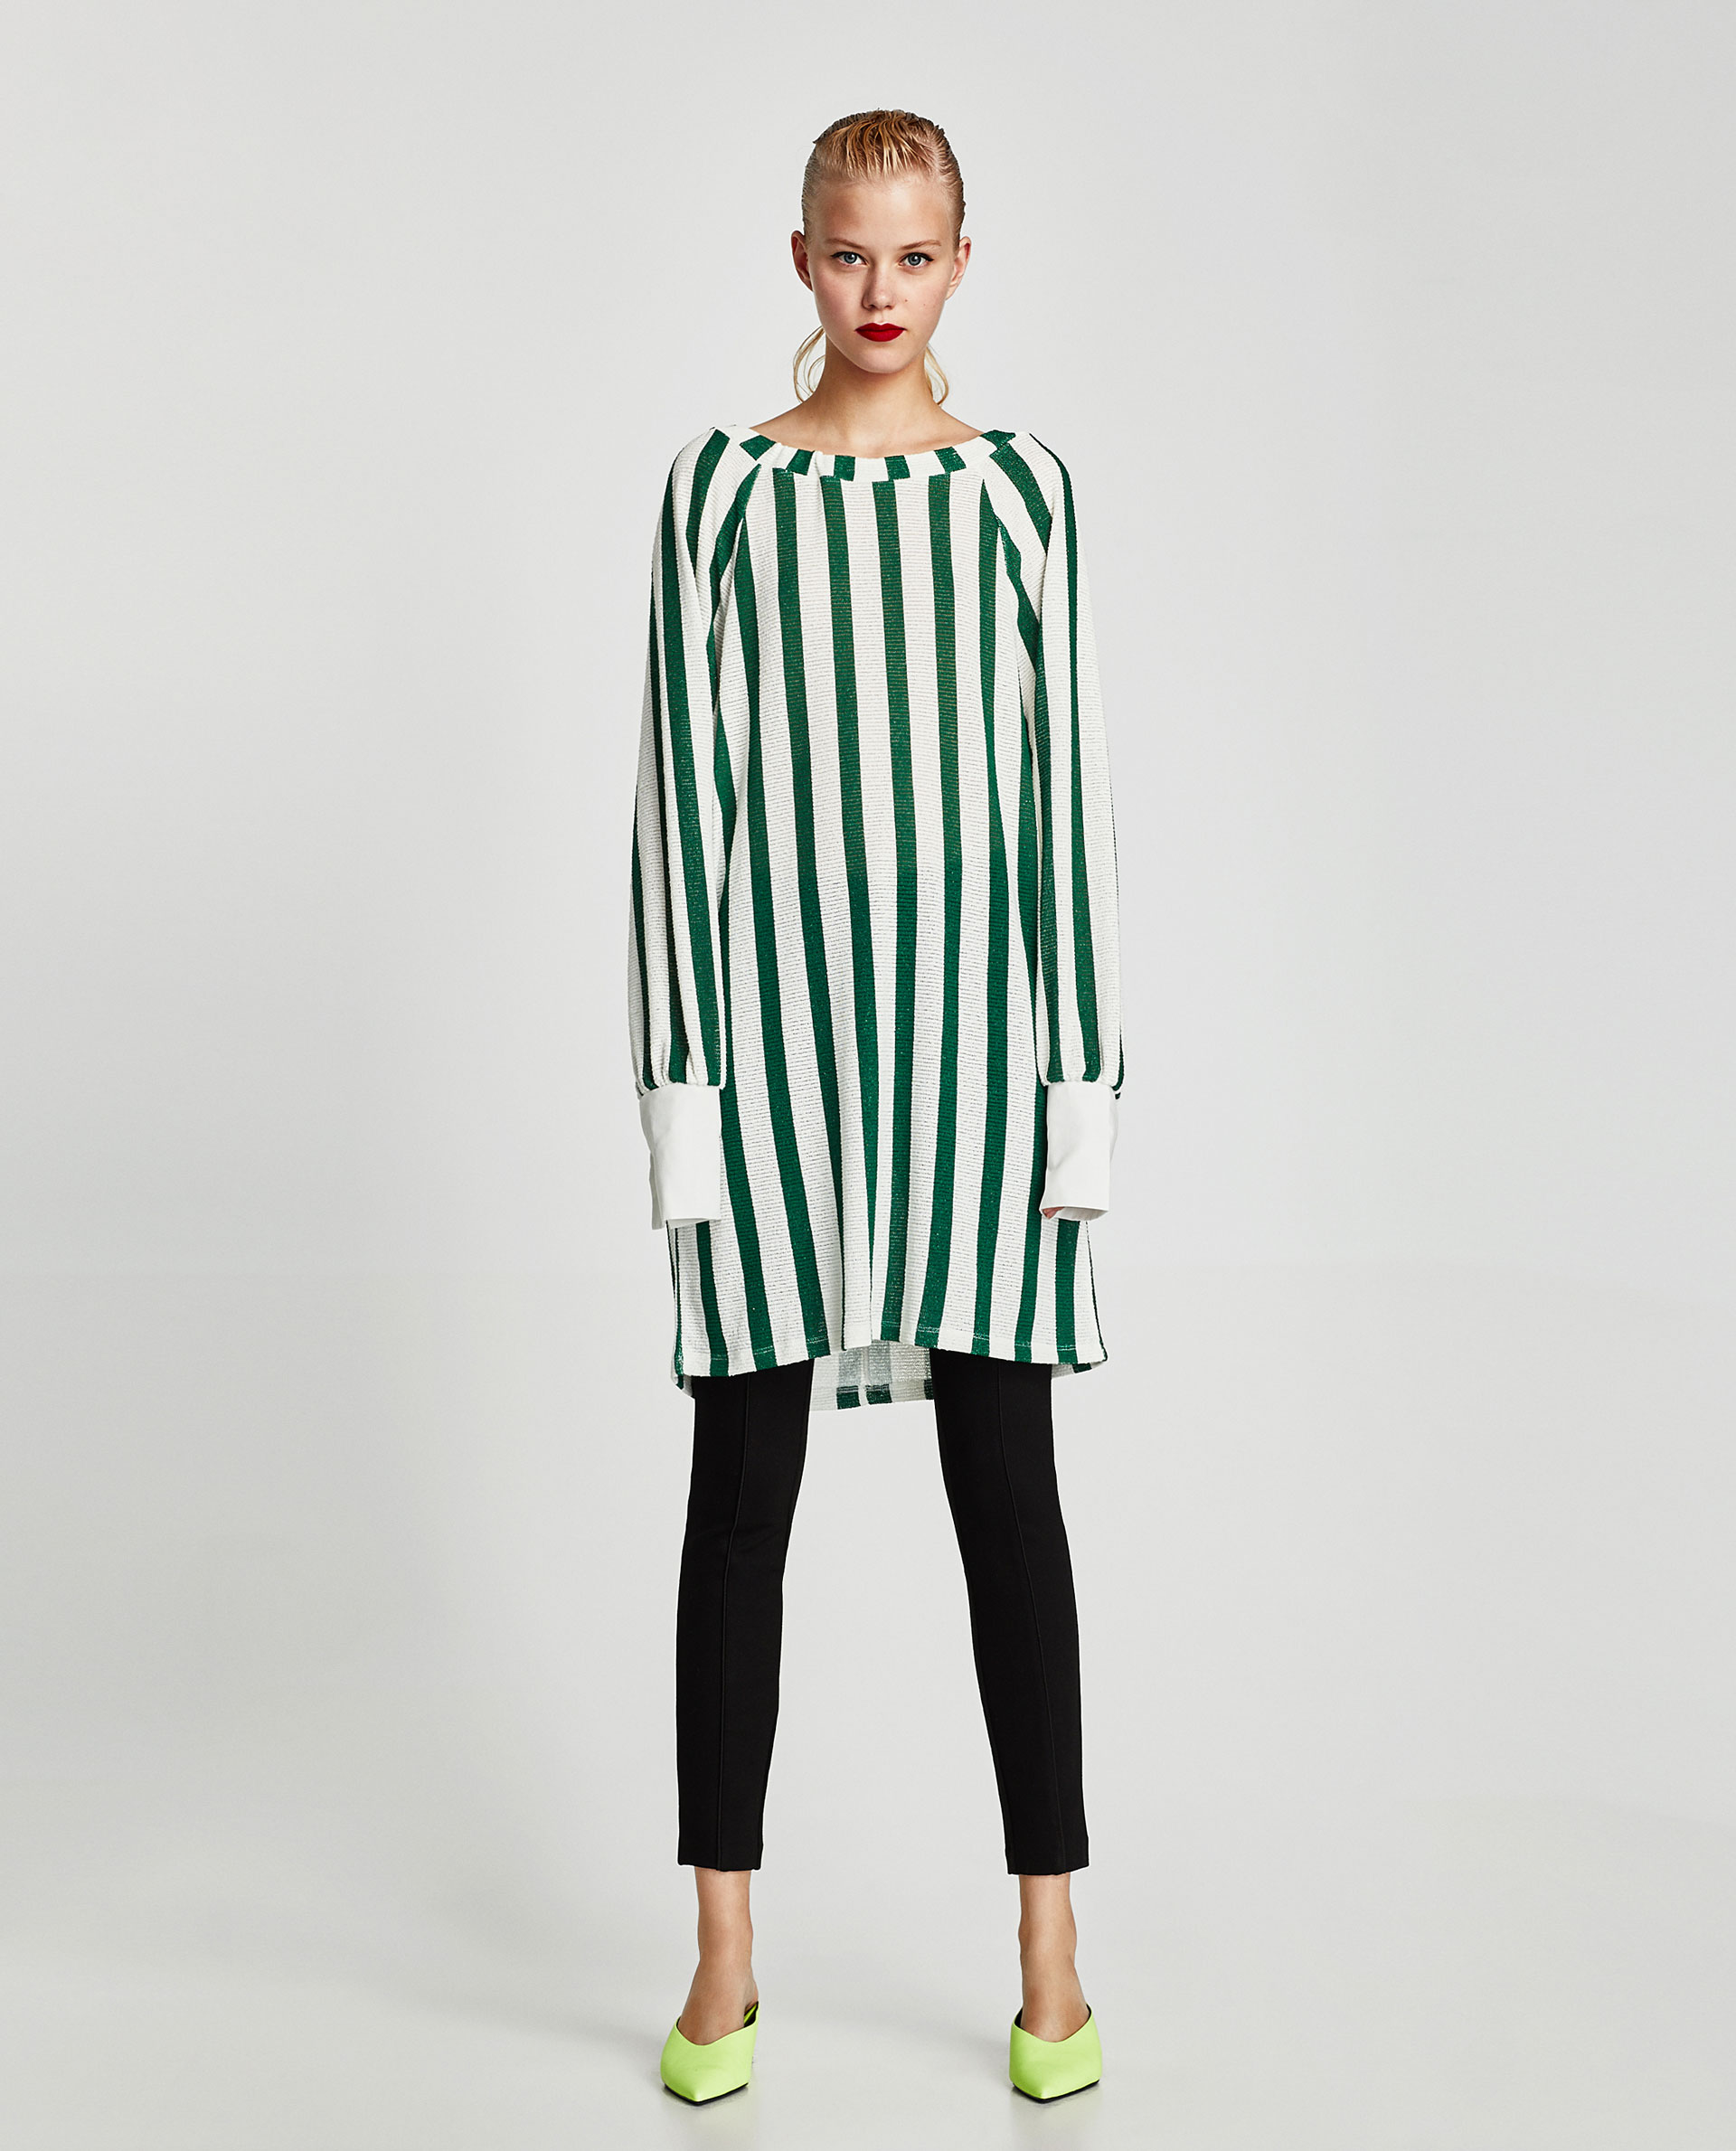 Sayuri Villalba – Zara TRAFALUC Green Stripes 1